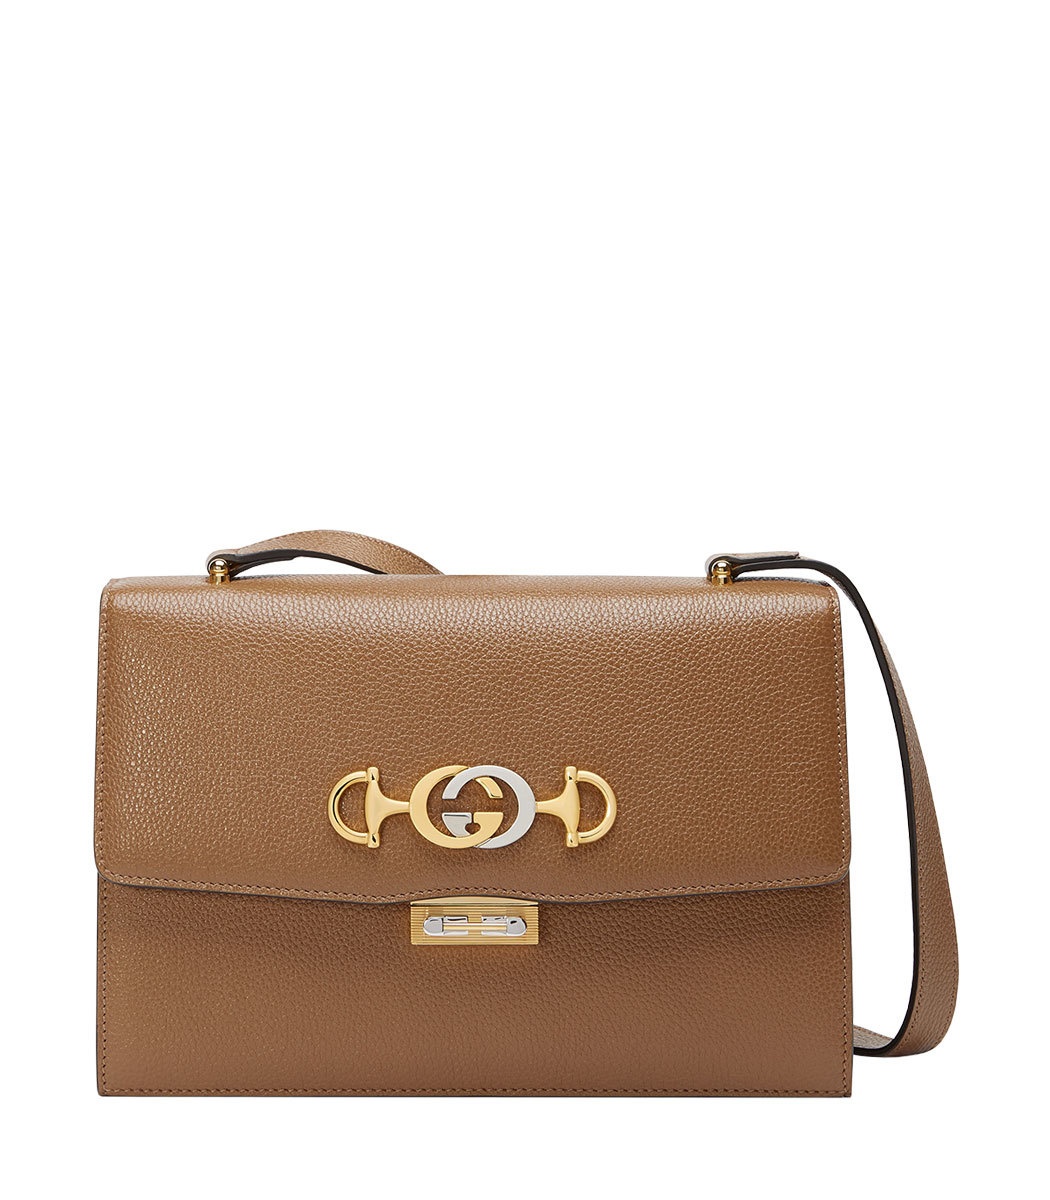 cc8cc330f Gucci Gucci Zumi Grainy Leather Small Shoulder Bag - ShopBAZAAR